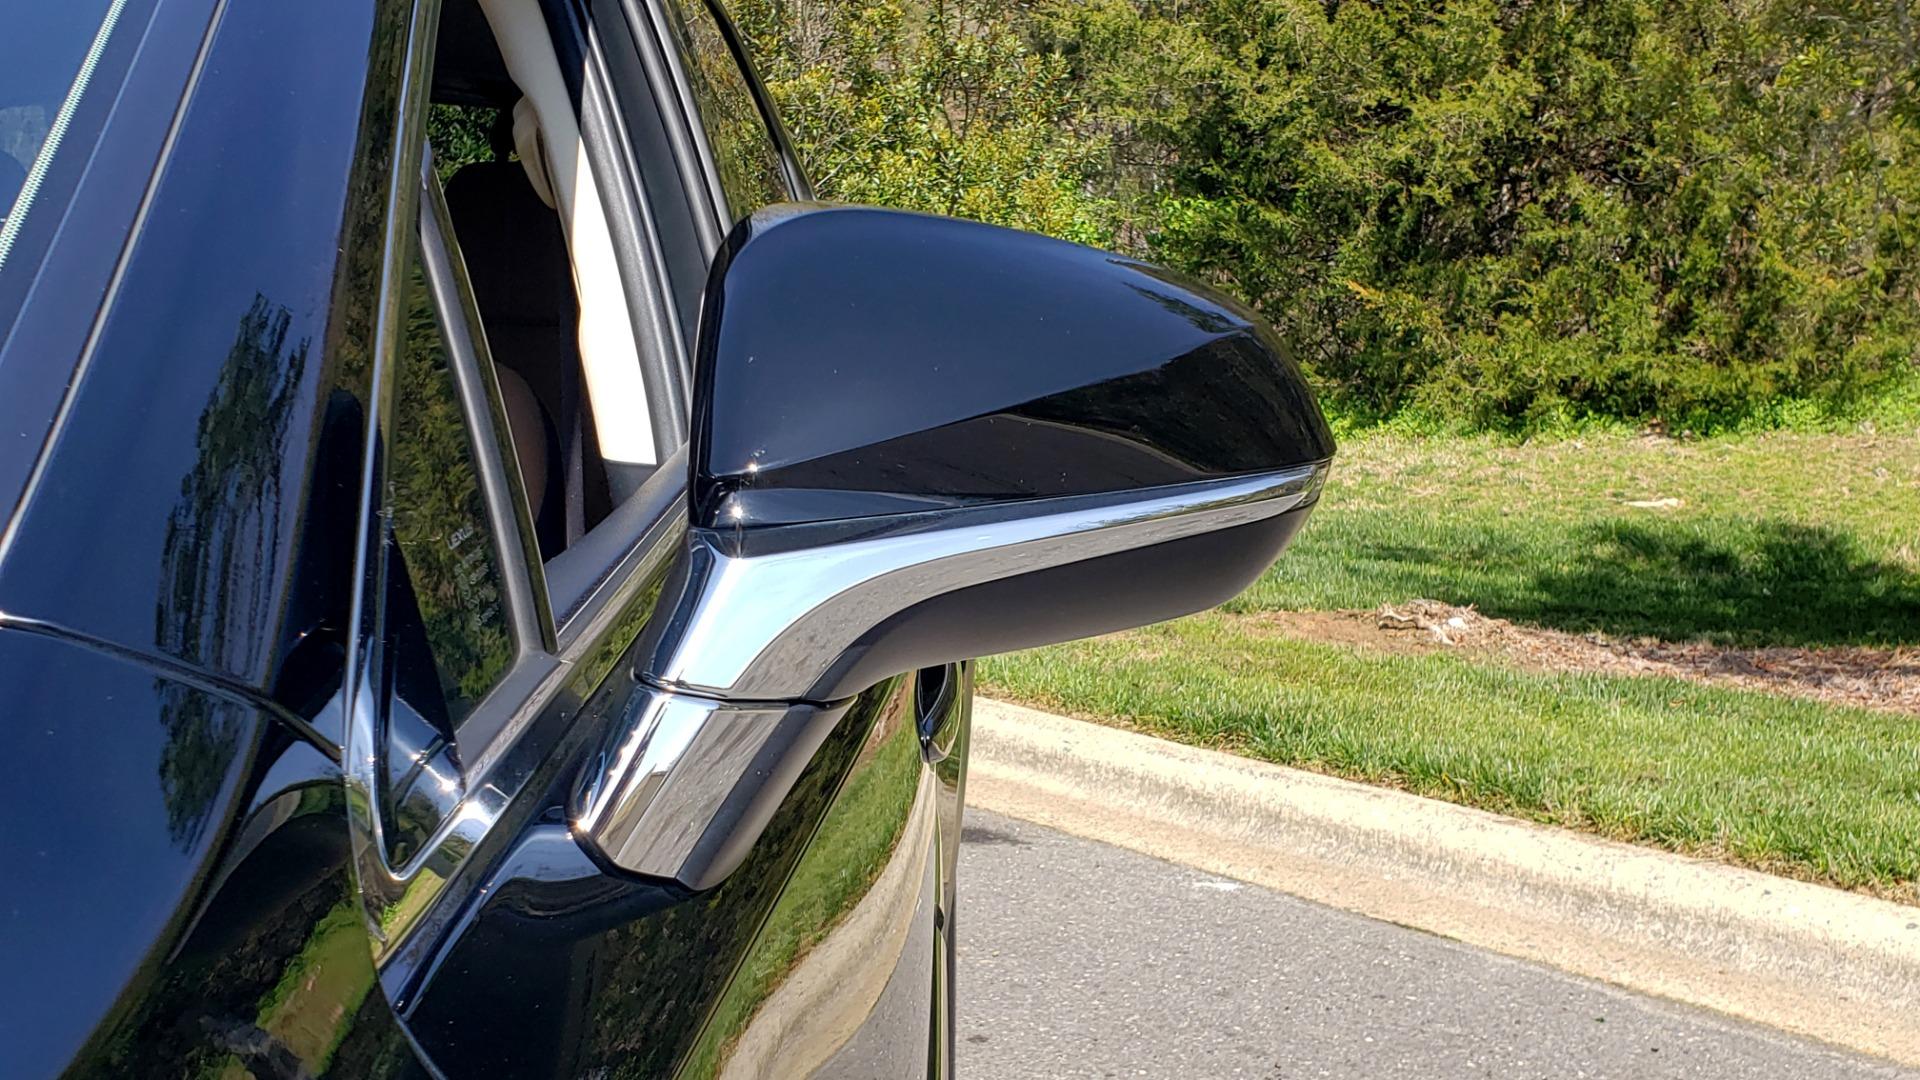 Used 2016 Lexus NX 200T PREM PKG / NAV / SUNROOF / PRE-COLLISION / PARK ASST for sale Sold at Formula Imports in Charlotte NC 28227 25